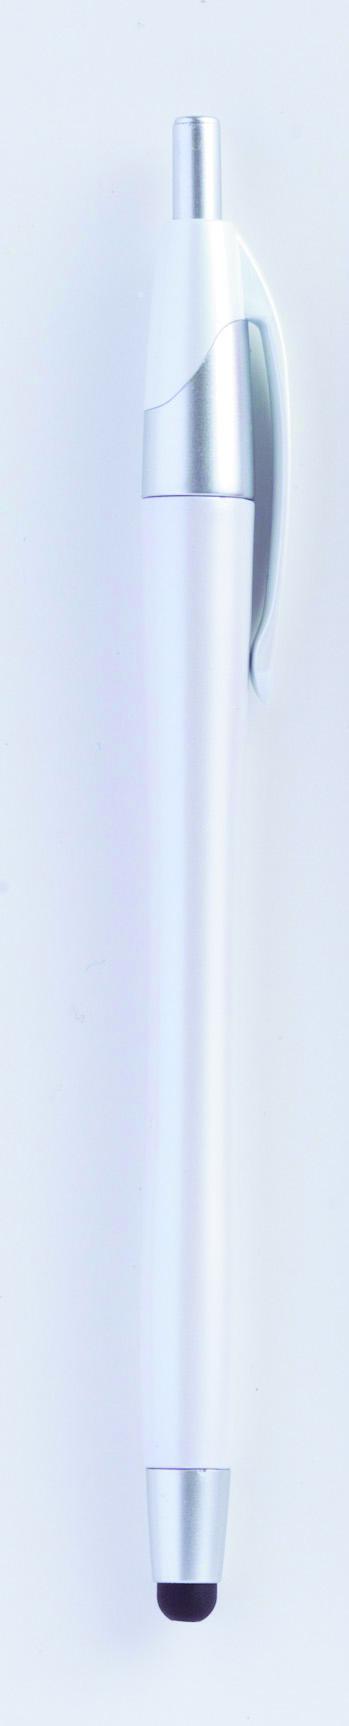 sd143347